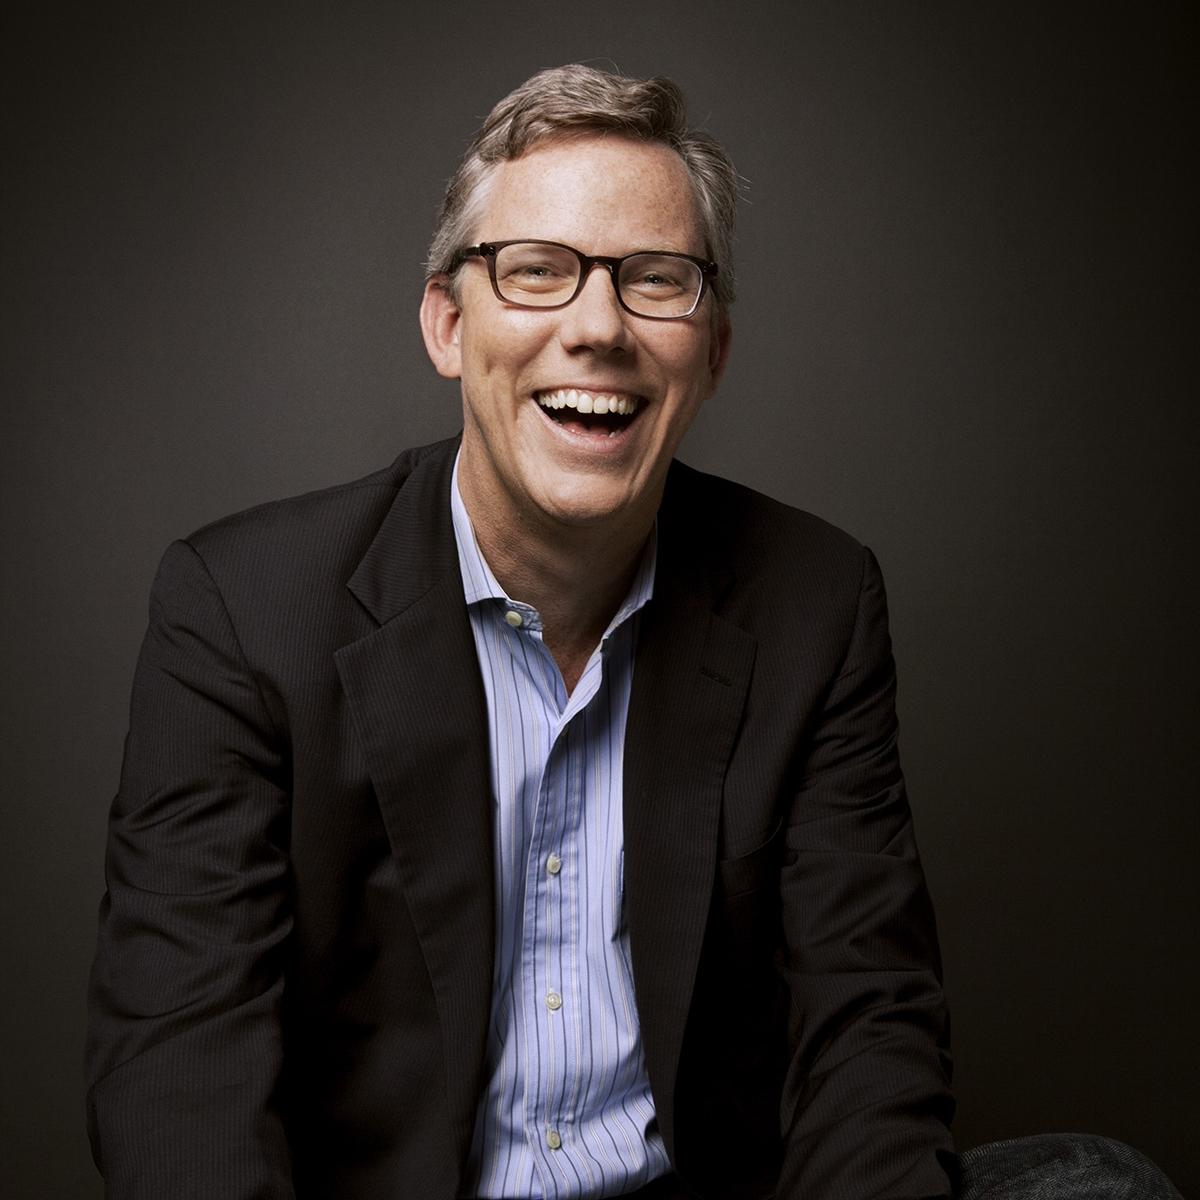 Brian Halligan   Hubspot  Co-founder & CEO